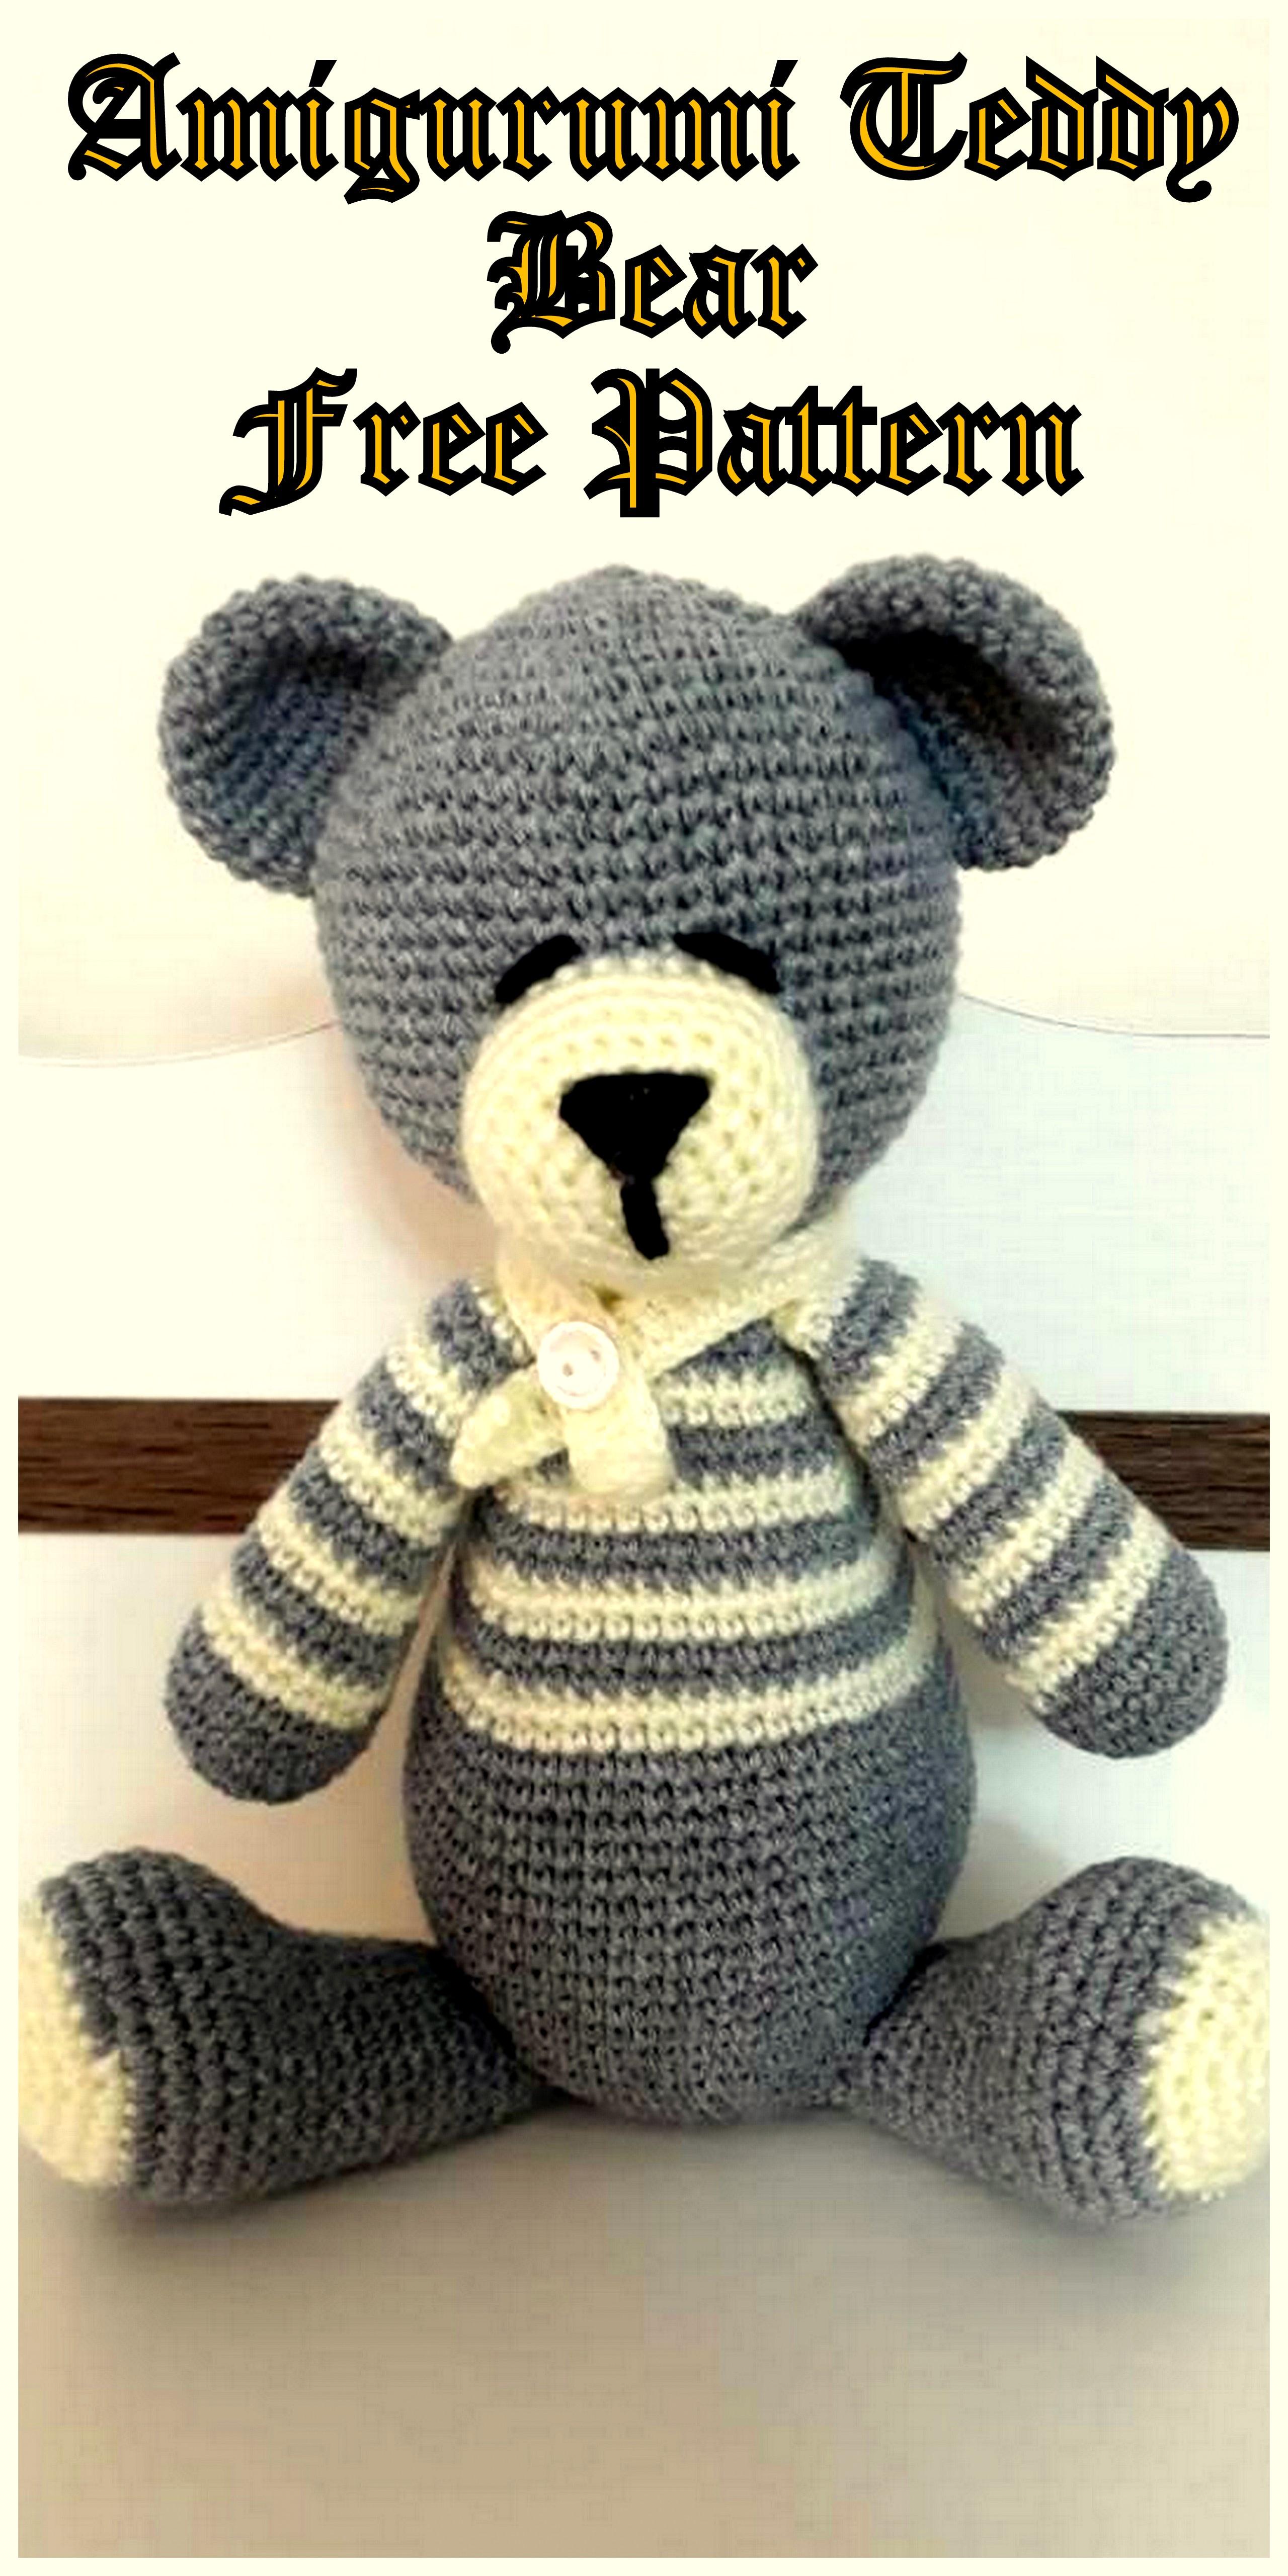 57+ New and Trend Amigurumi Bear Crochet Ideas - Page 33 of 57 ... | 5120x2560